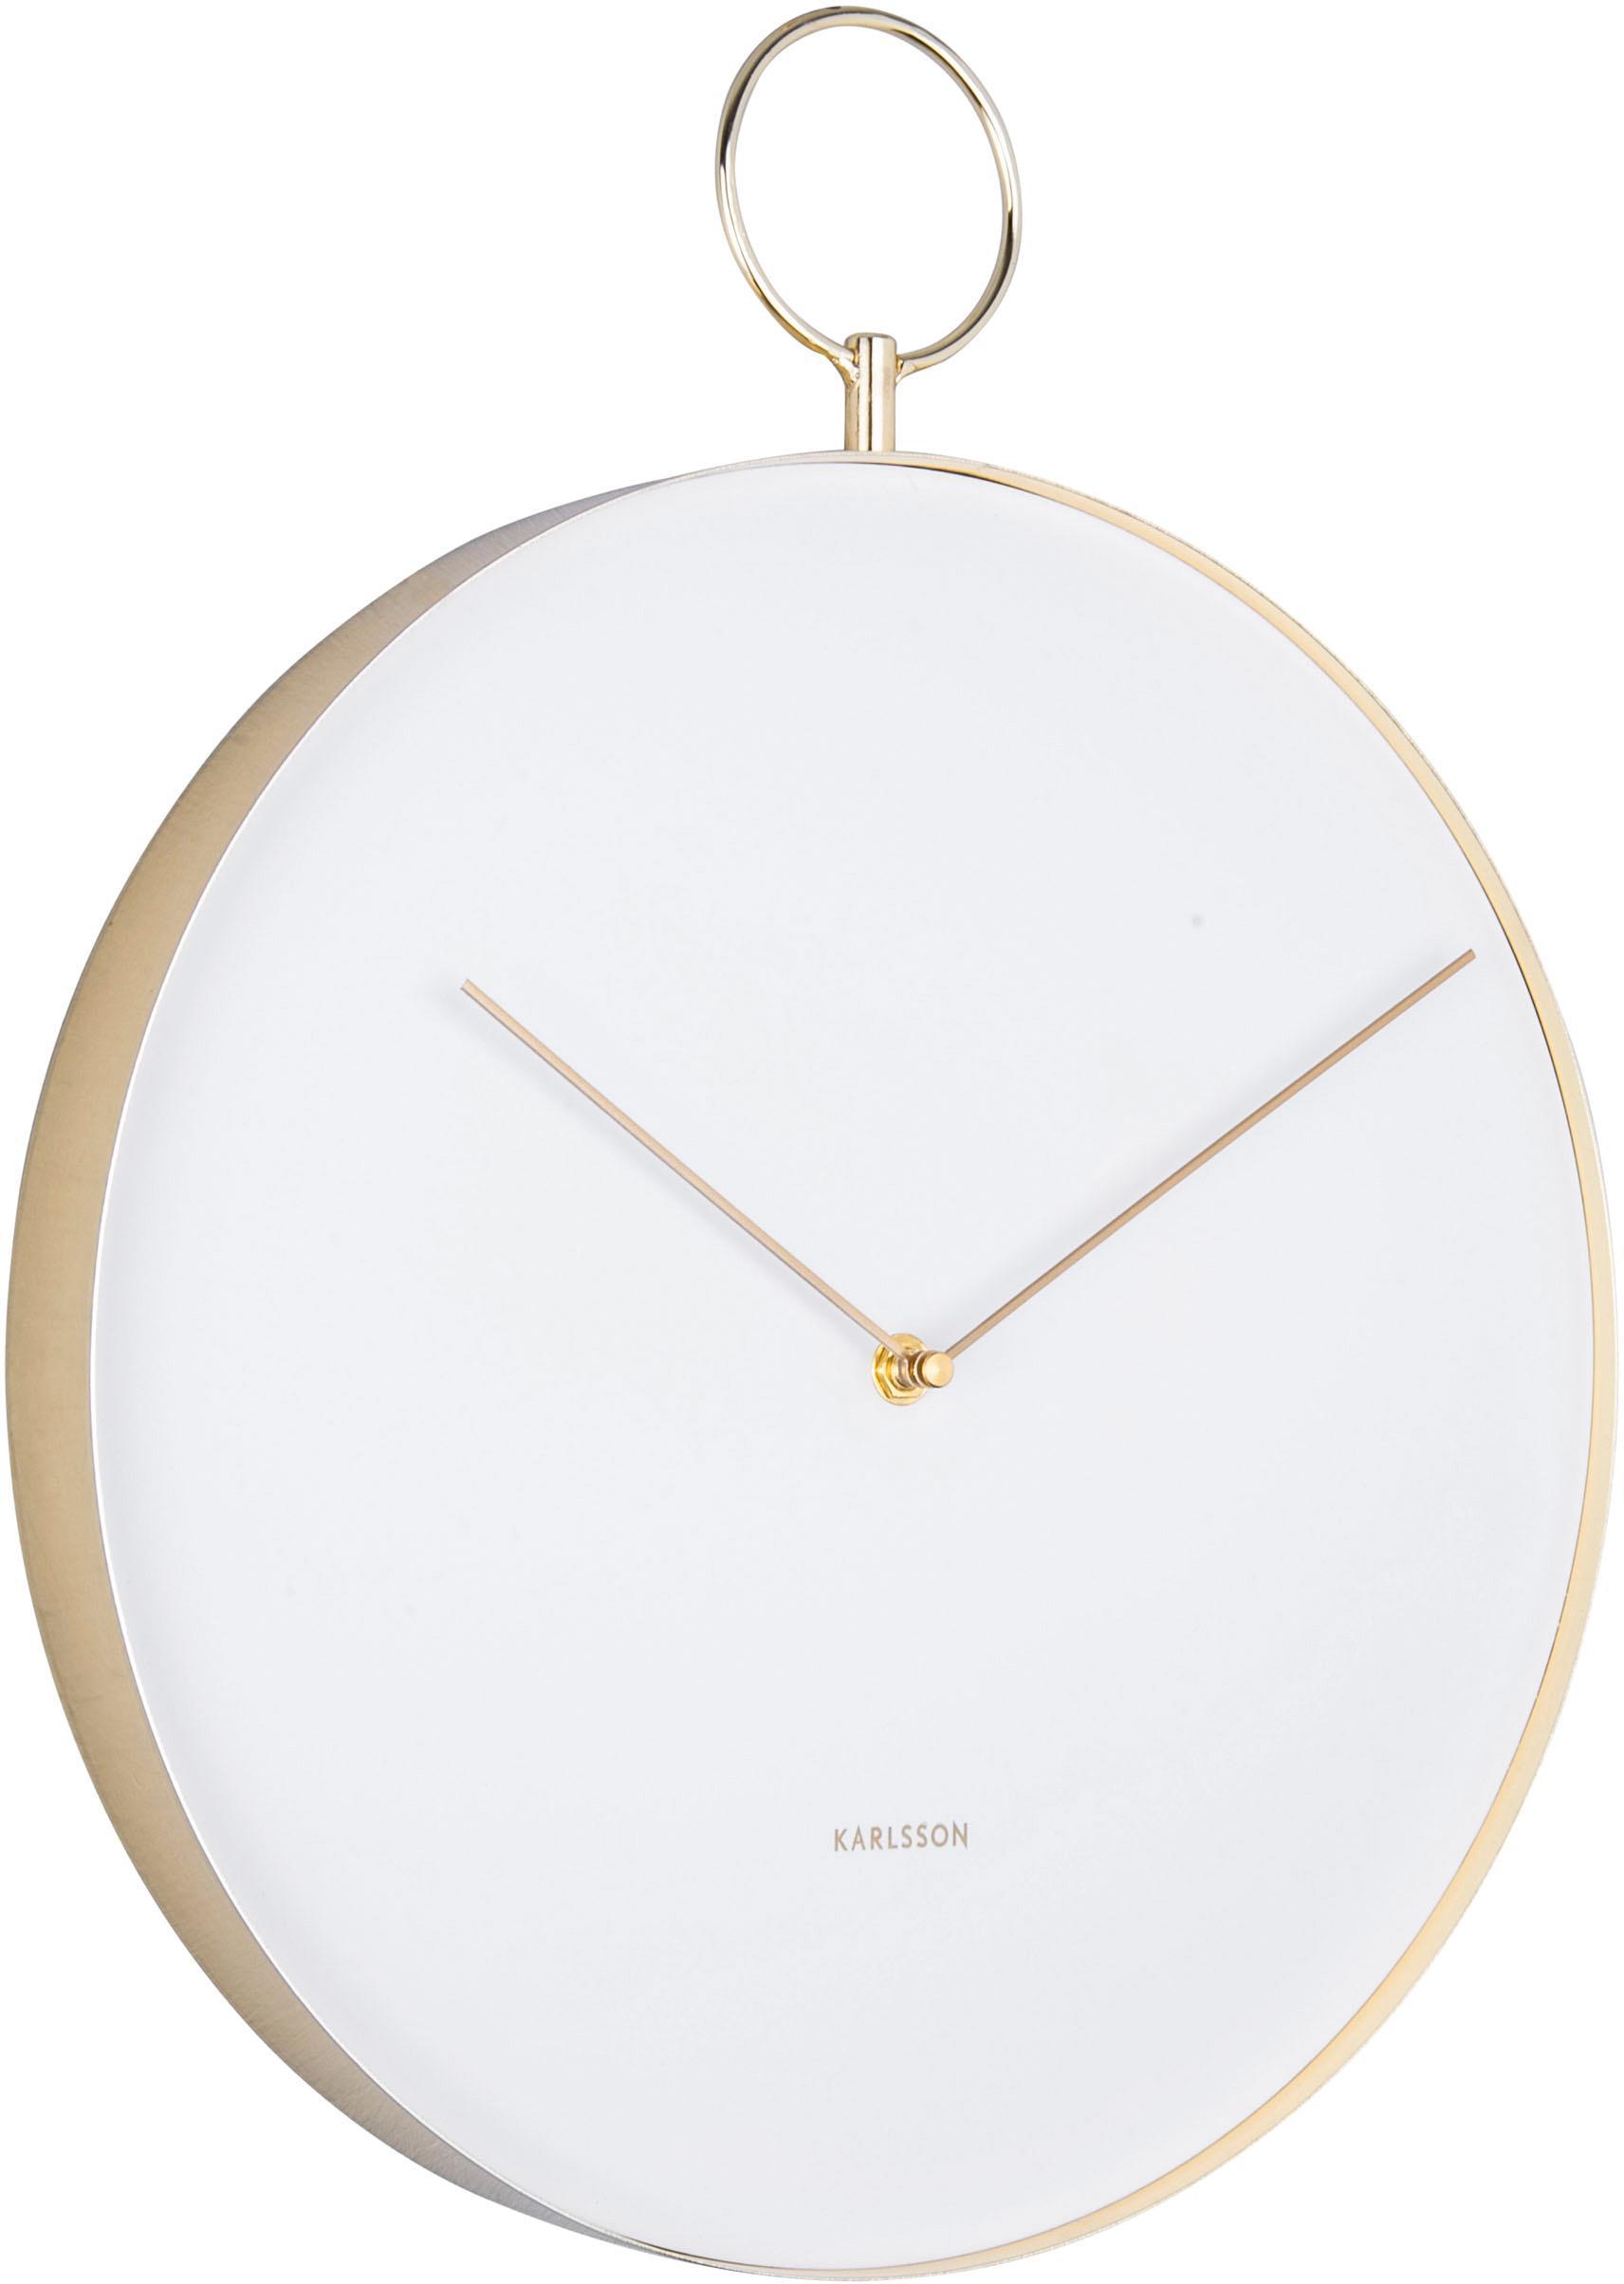 Reloj de pared Hook, Metal recubierto, Blanco, latón, Ø 34 cm